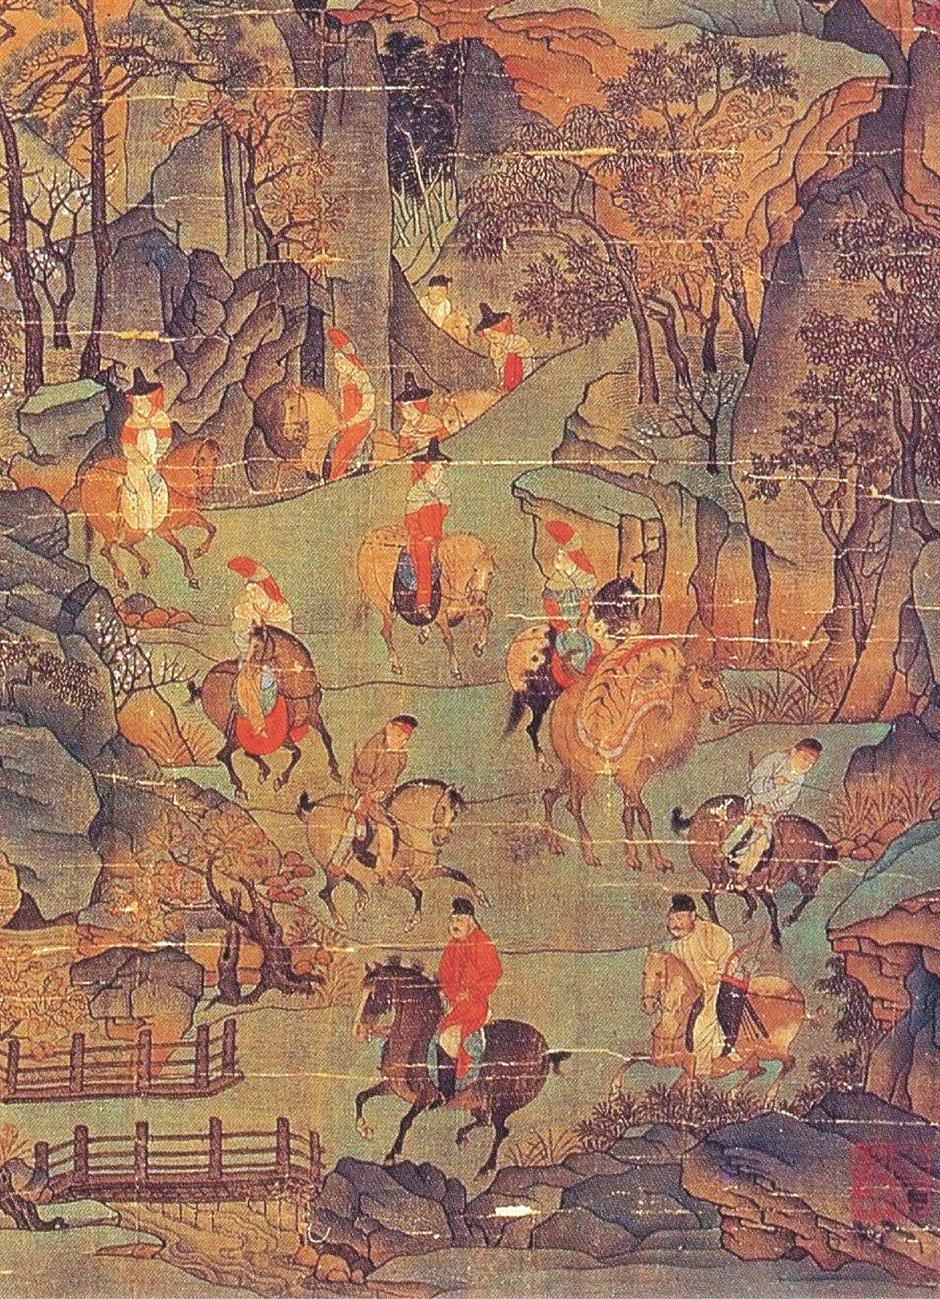 Emperor Xuanzong's Journey to Shu